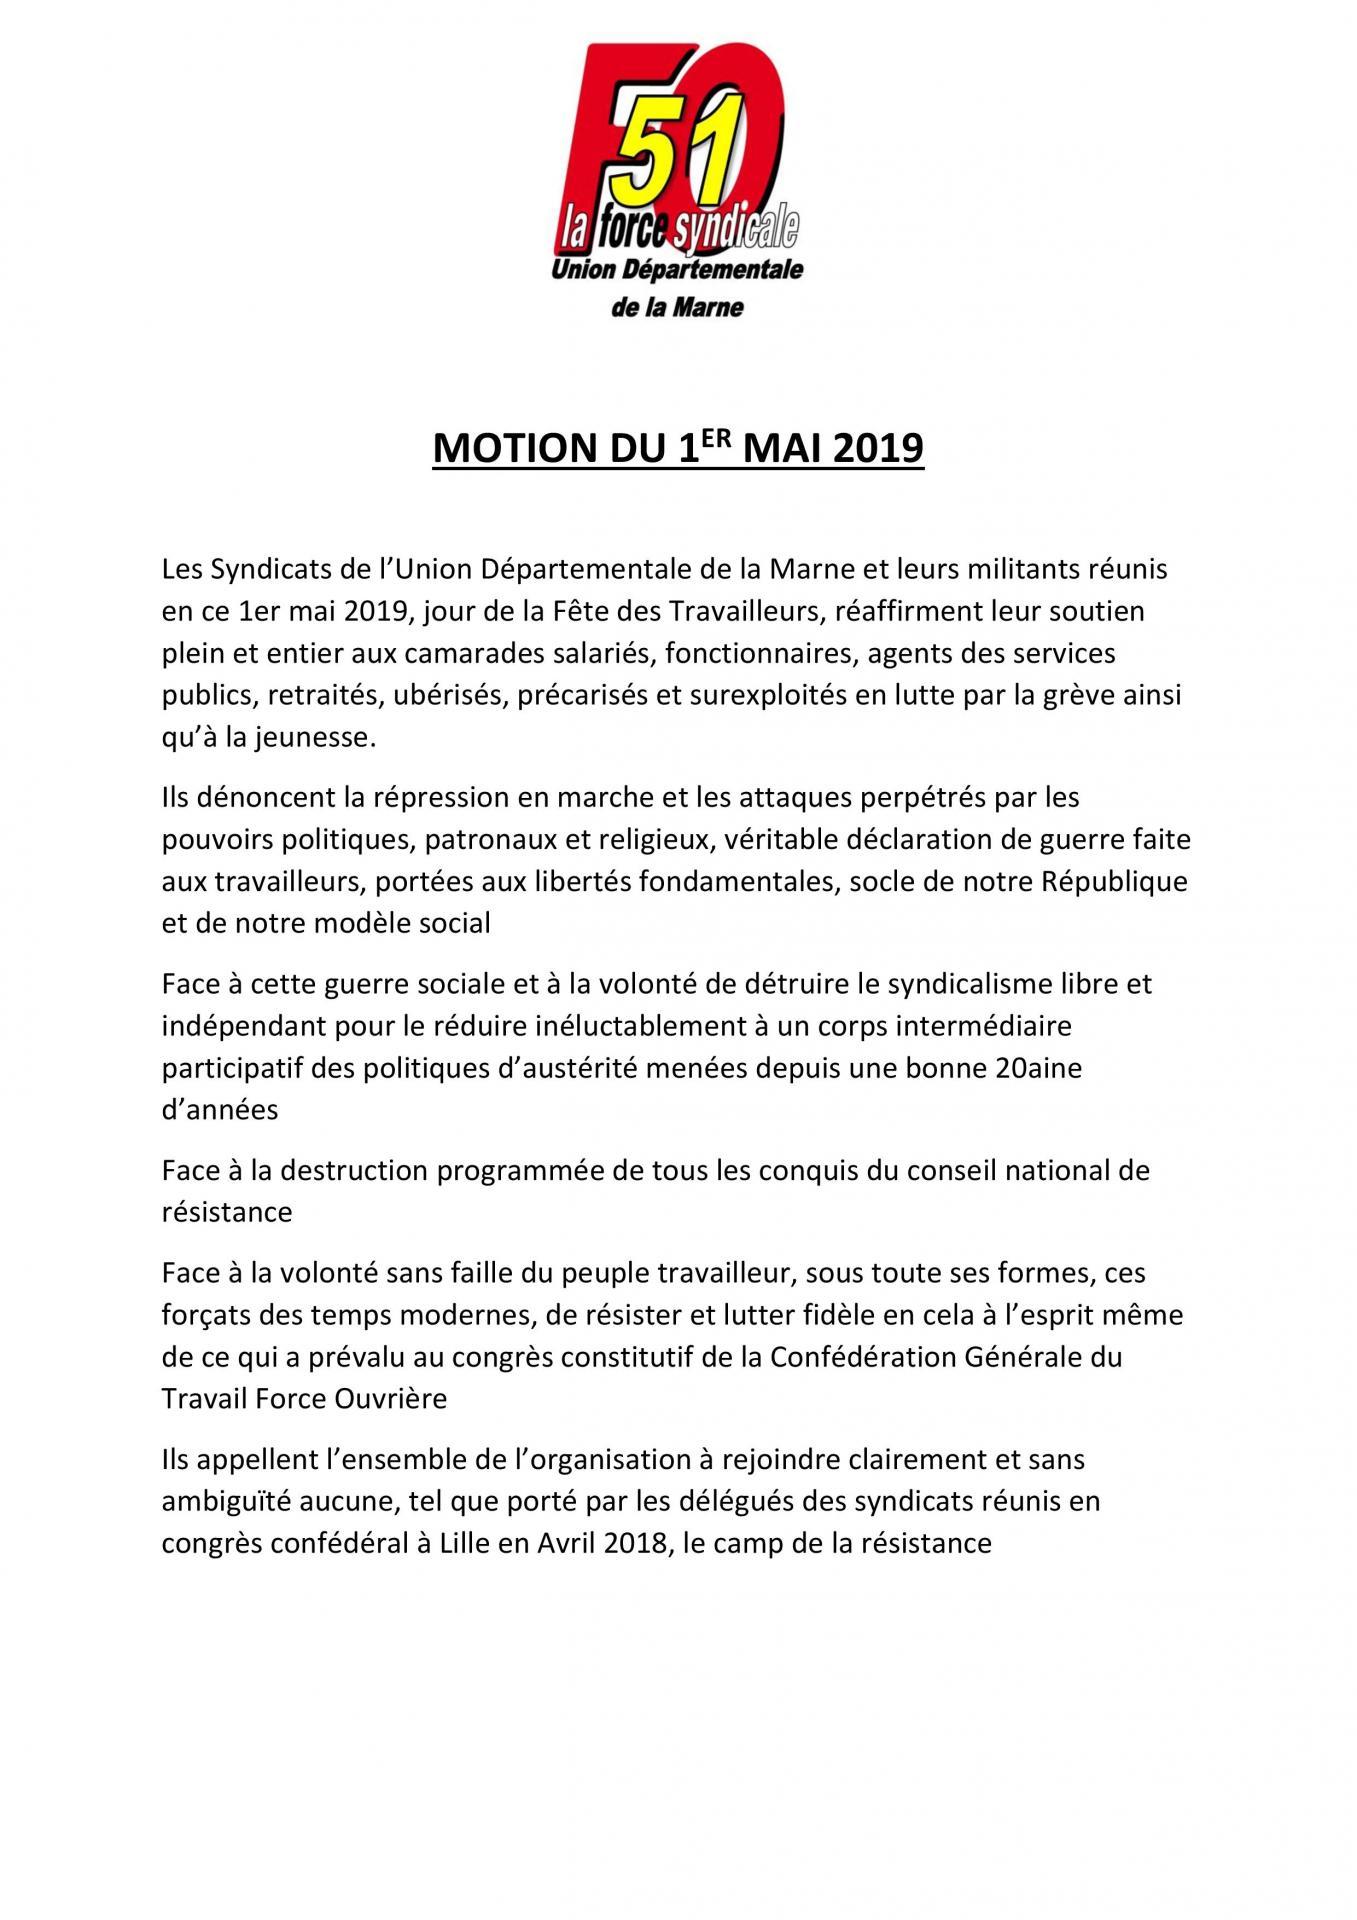 Motion du 1er mai 2019 page 001